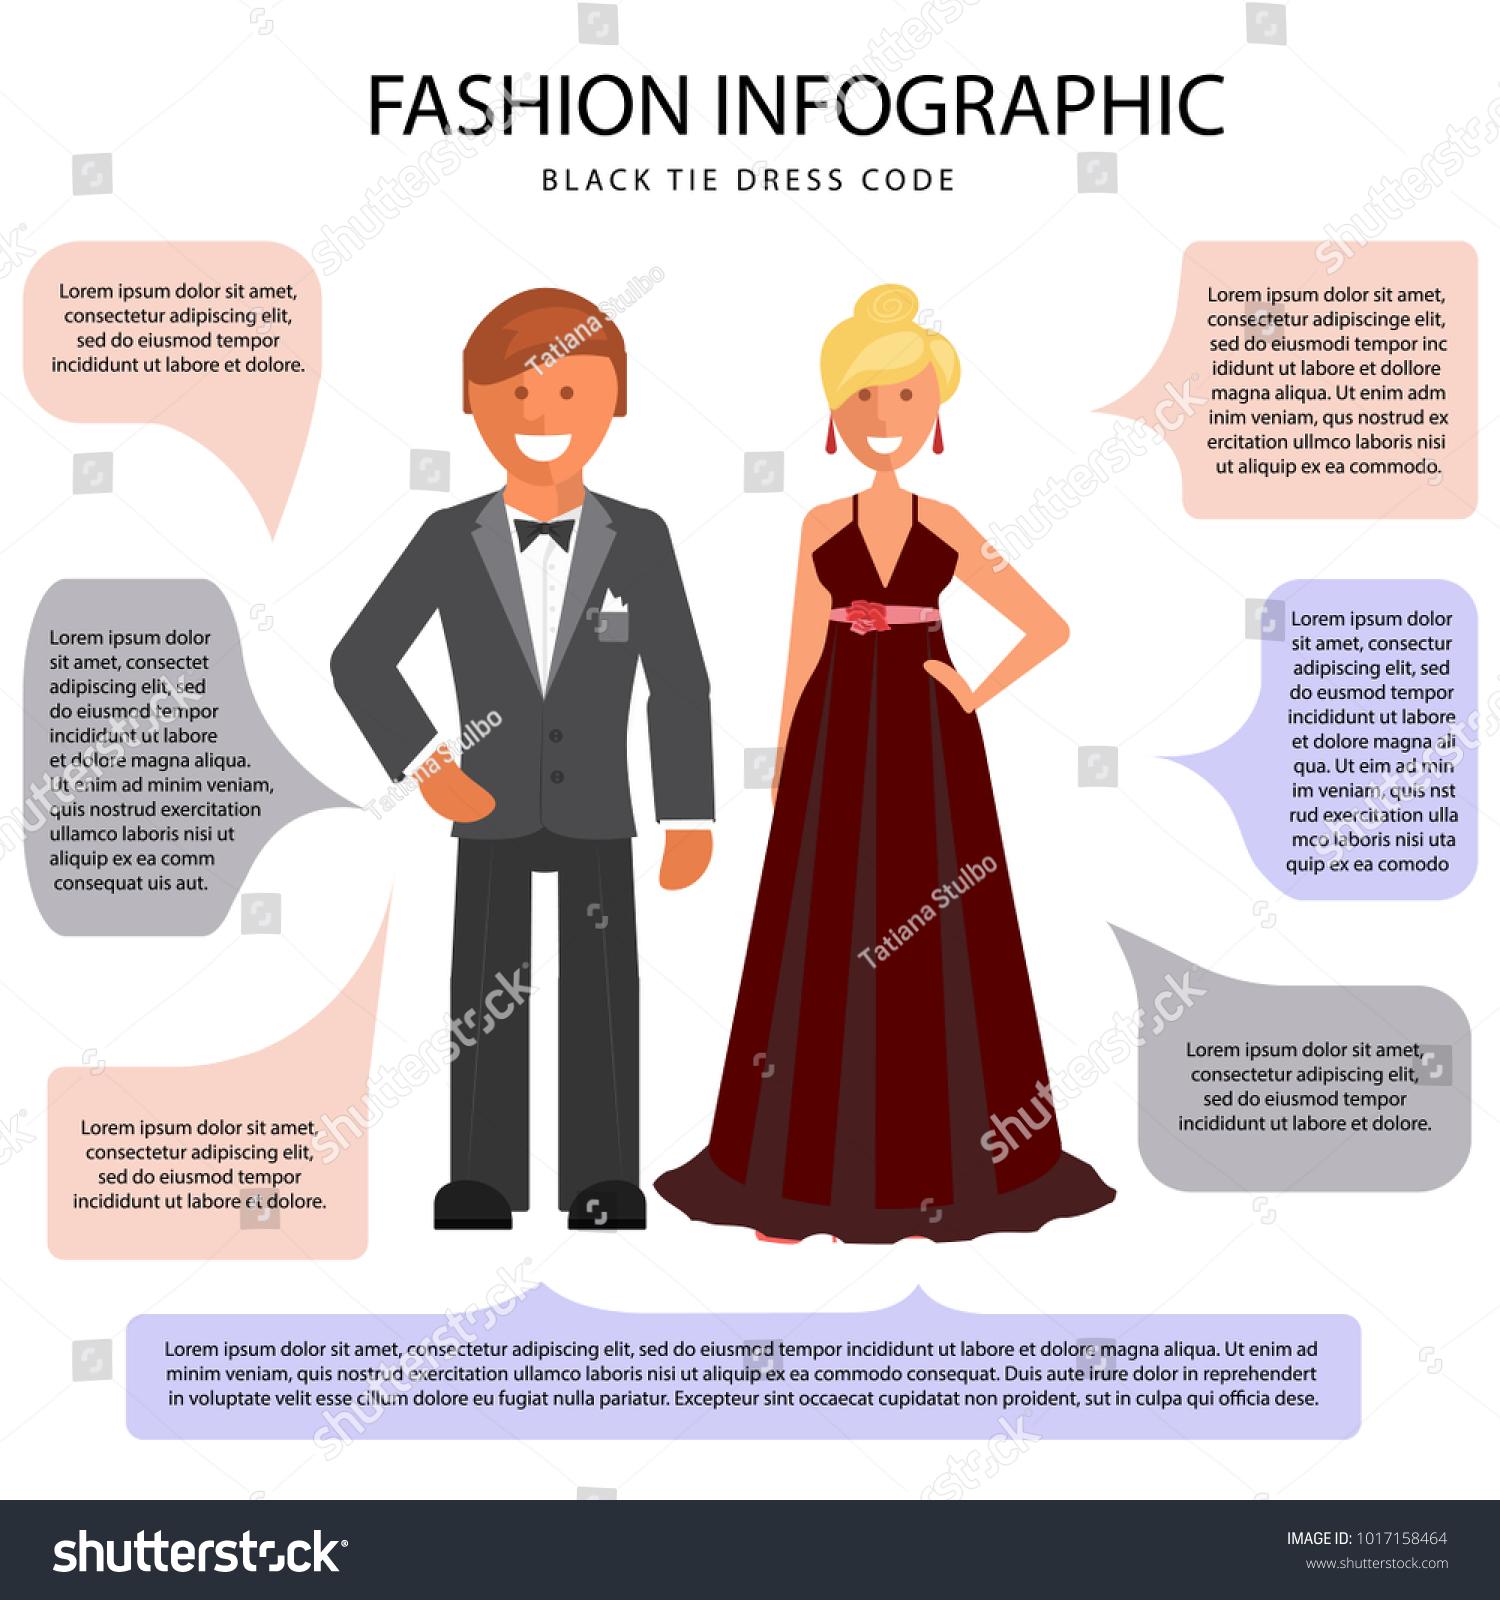 Black Tie Dress Code Infographic Man Stock-Vektorgrafik 1017158464 ...